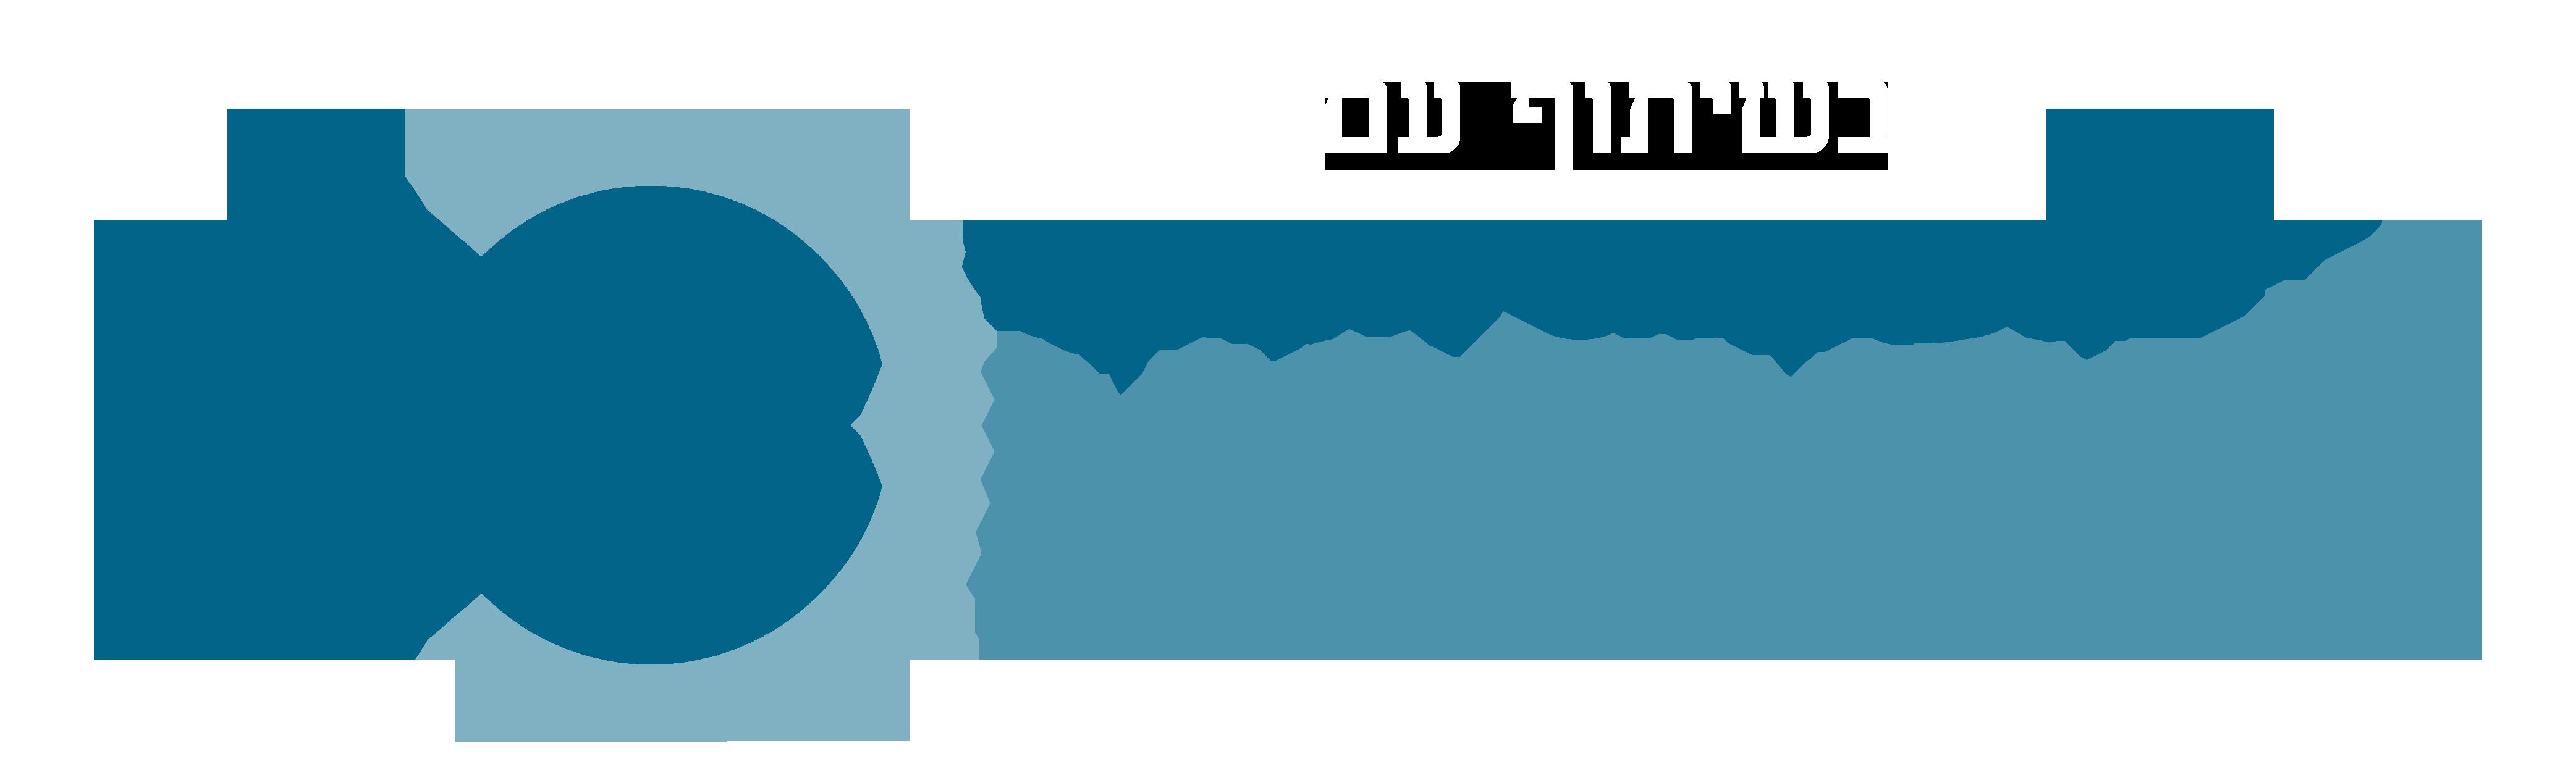 Grant-Cardone-Licensee-Program-Horizo